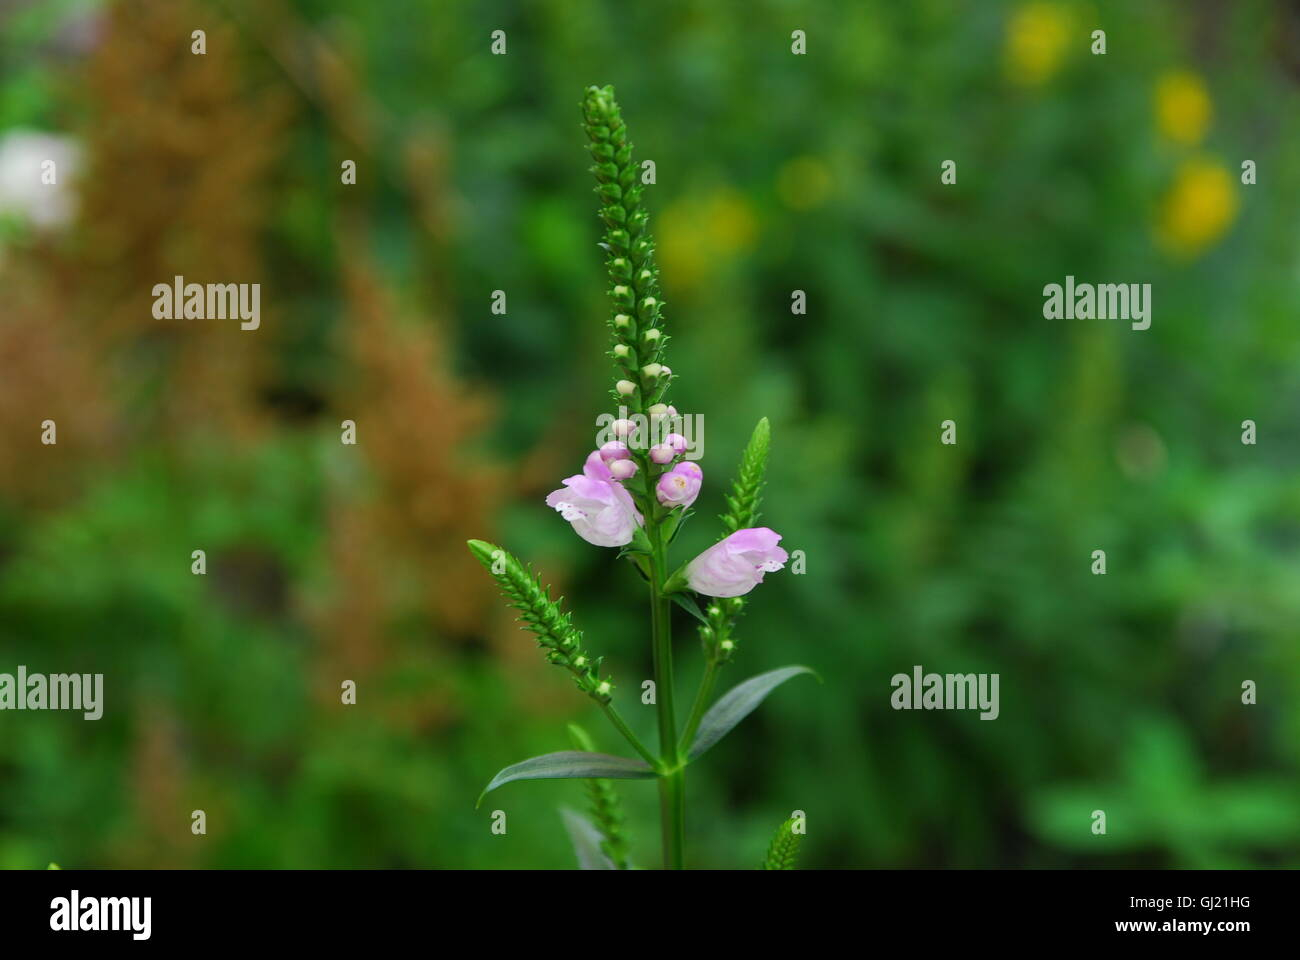 Obedient plant, false dragonhead, physostegia virginiana - Stock Image